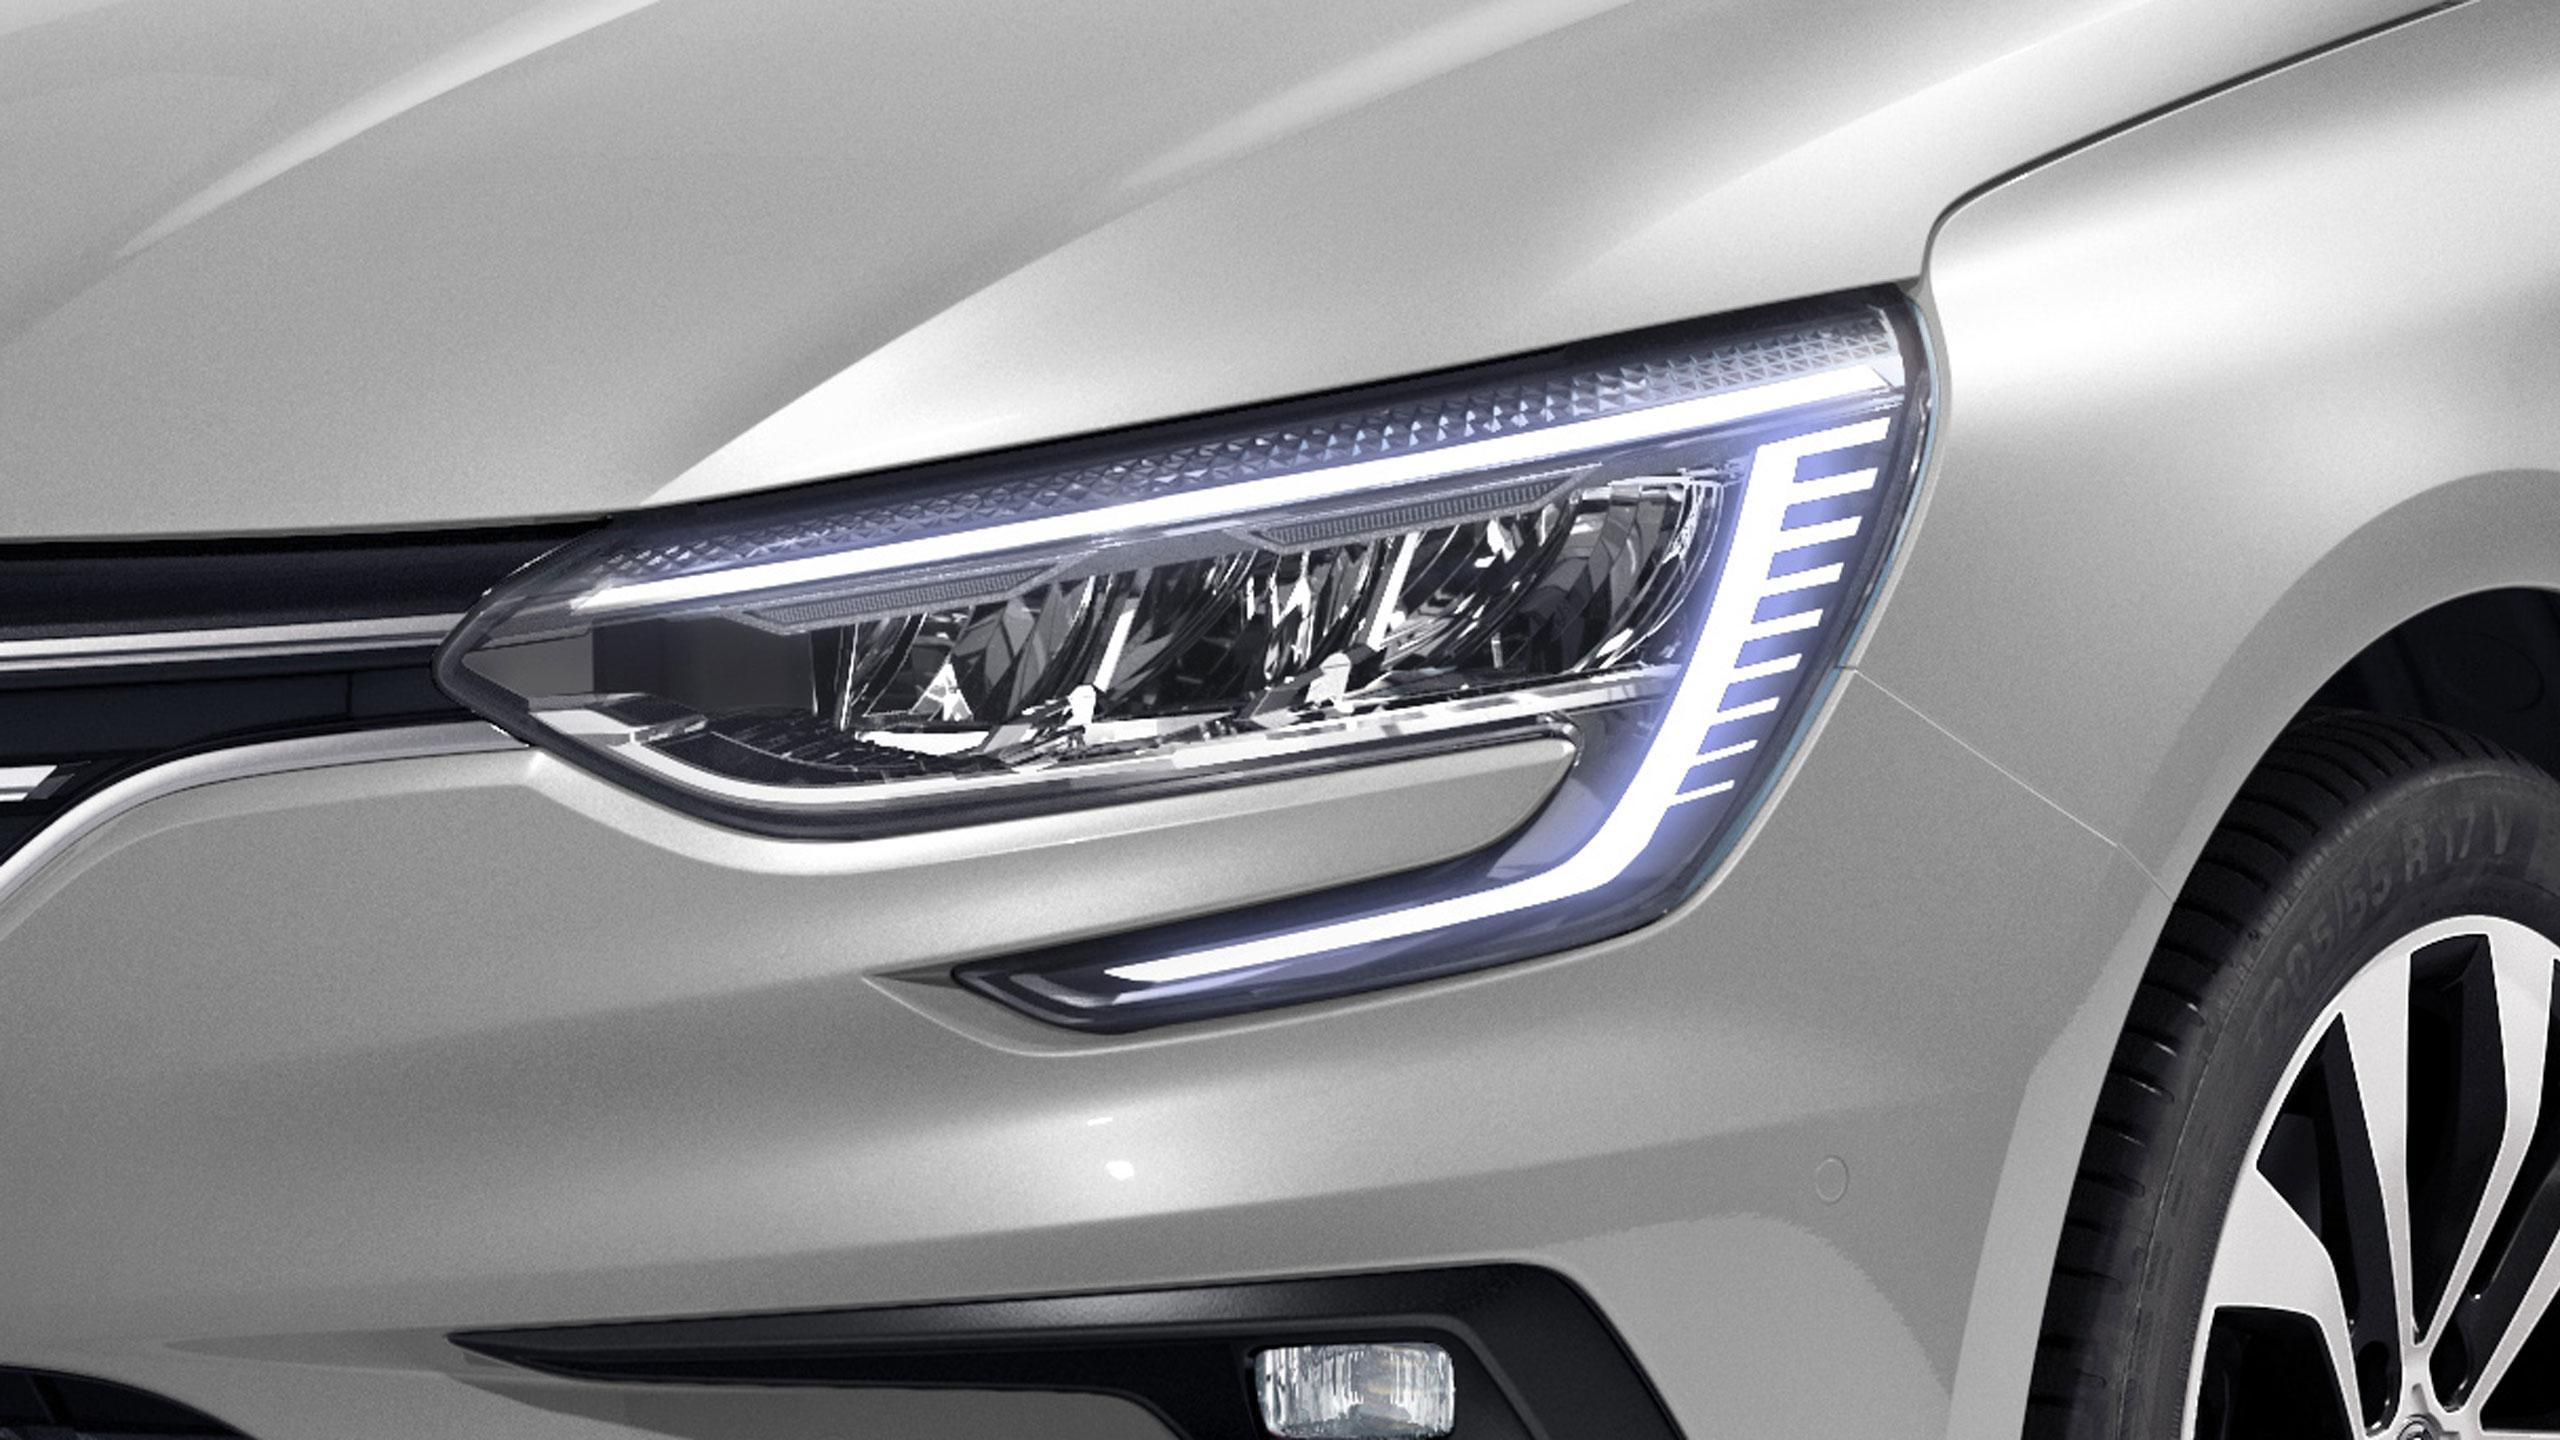 Daytime LED Headlights